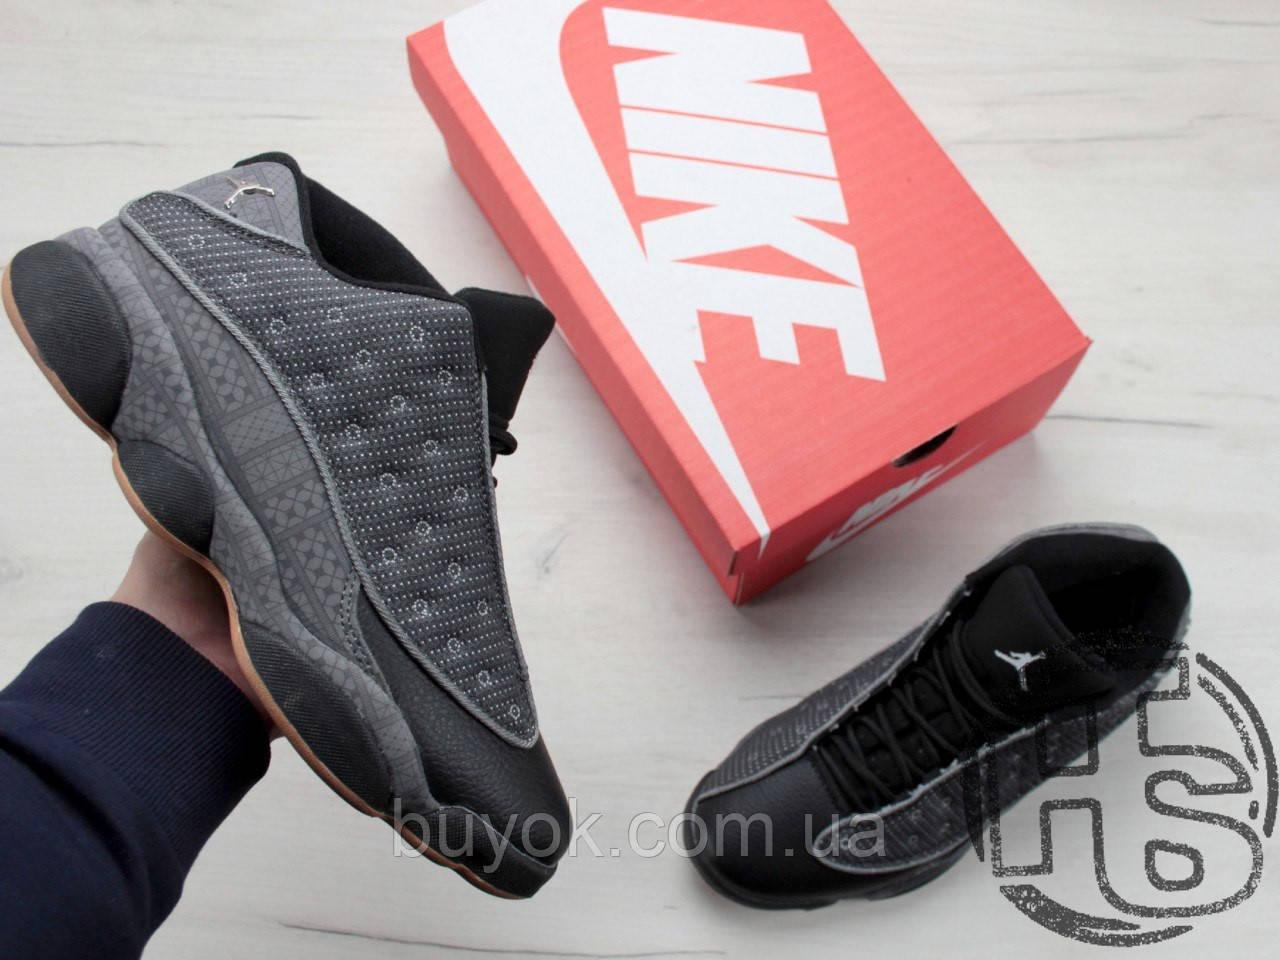 Мужские кроссовки Air Jordan 13 XIII Low Retro Quai 54 Black/Dark Grey/White/Chrome 810551-050